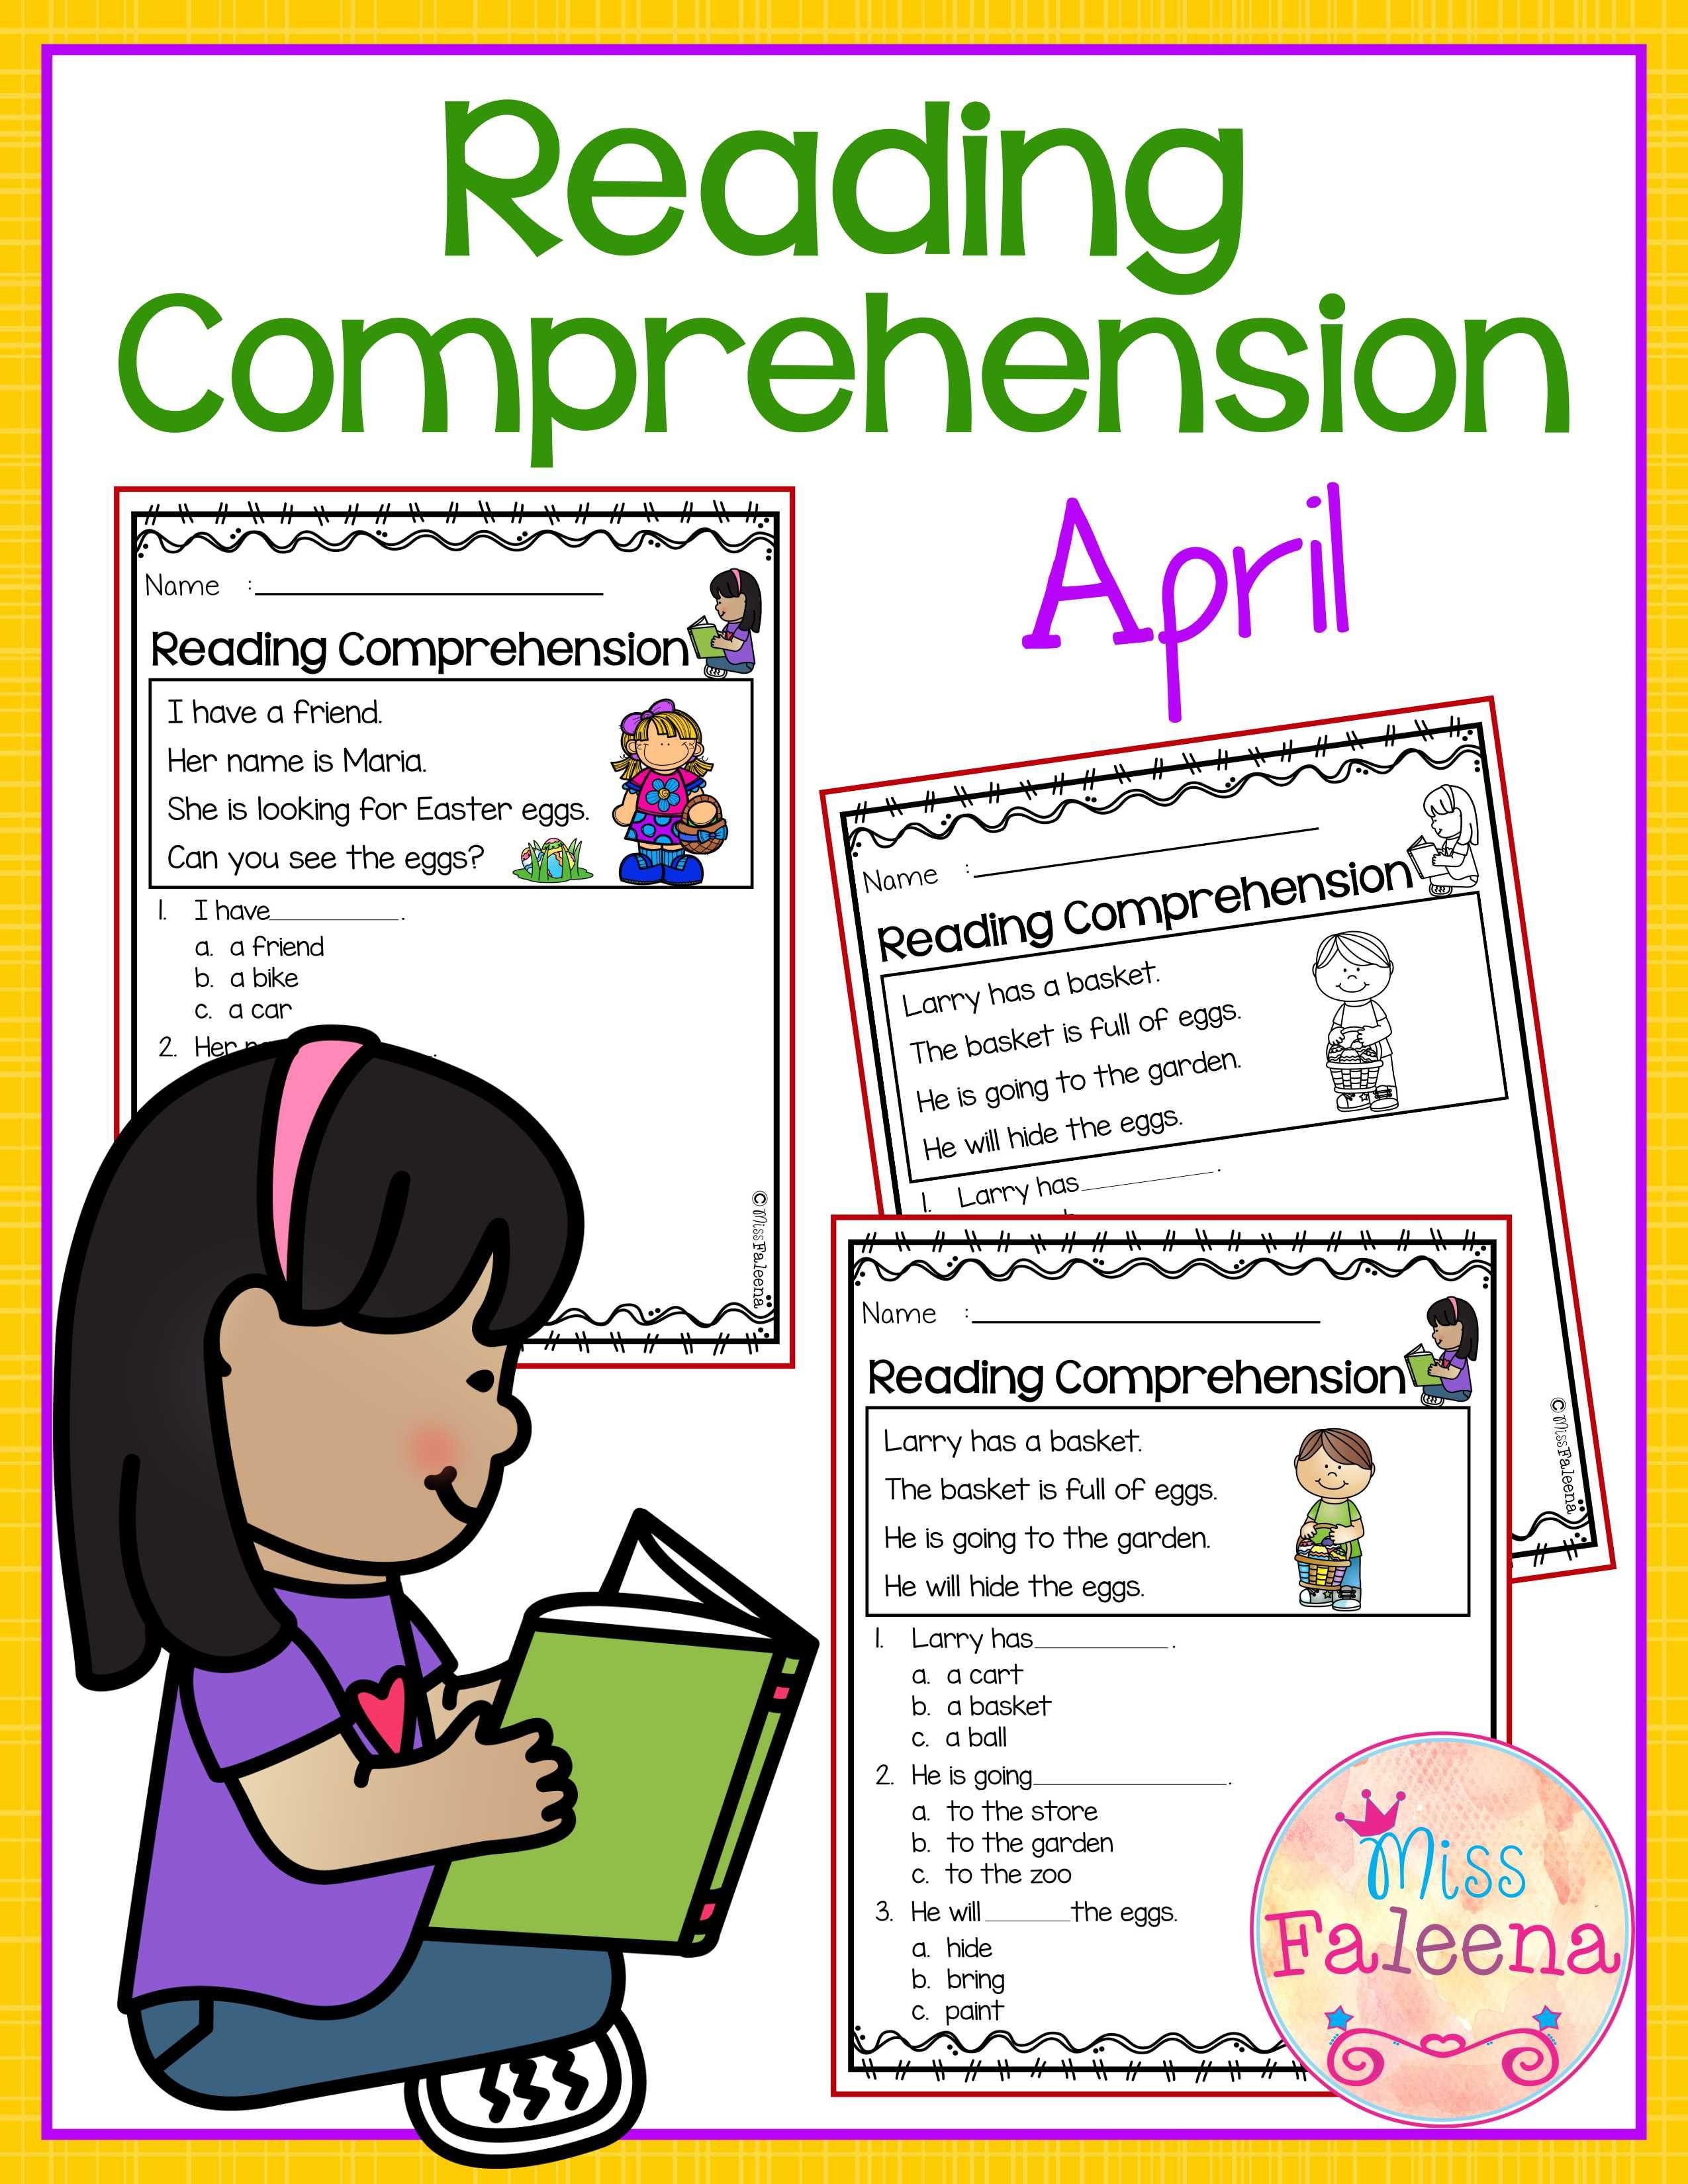 April Reading Comprehension Is Suitable For Kindergarten